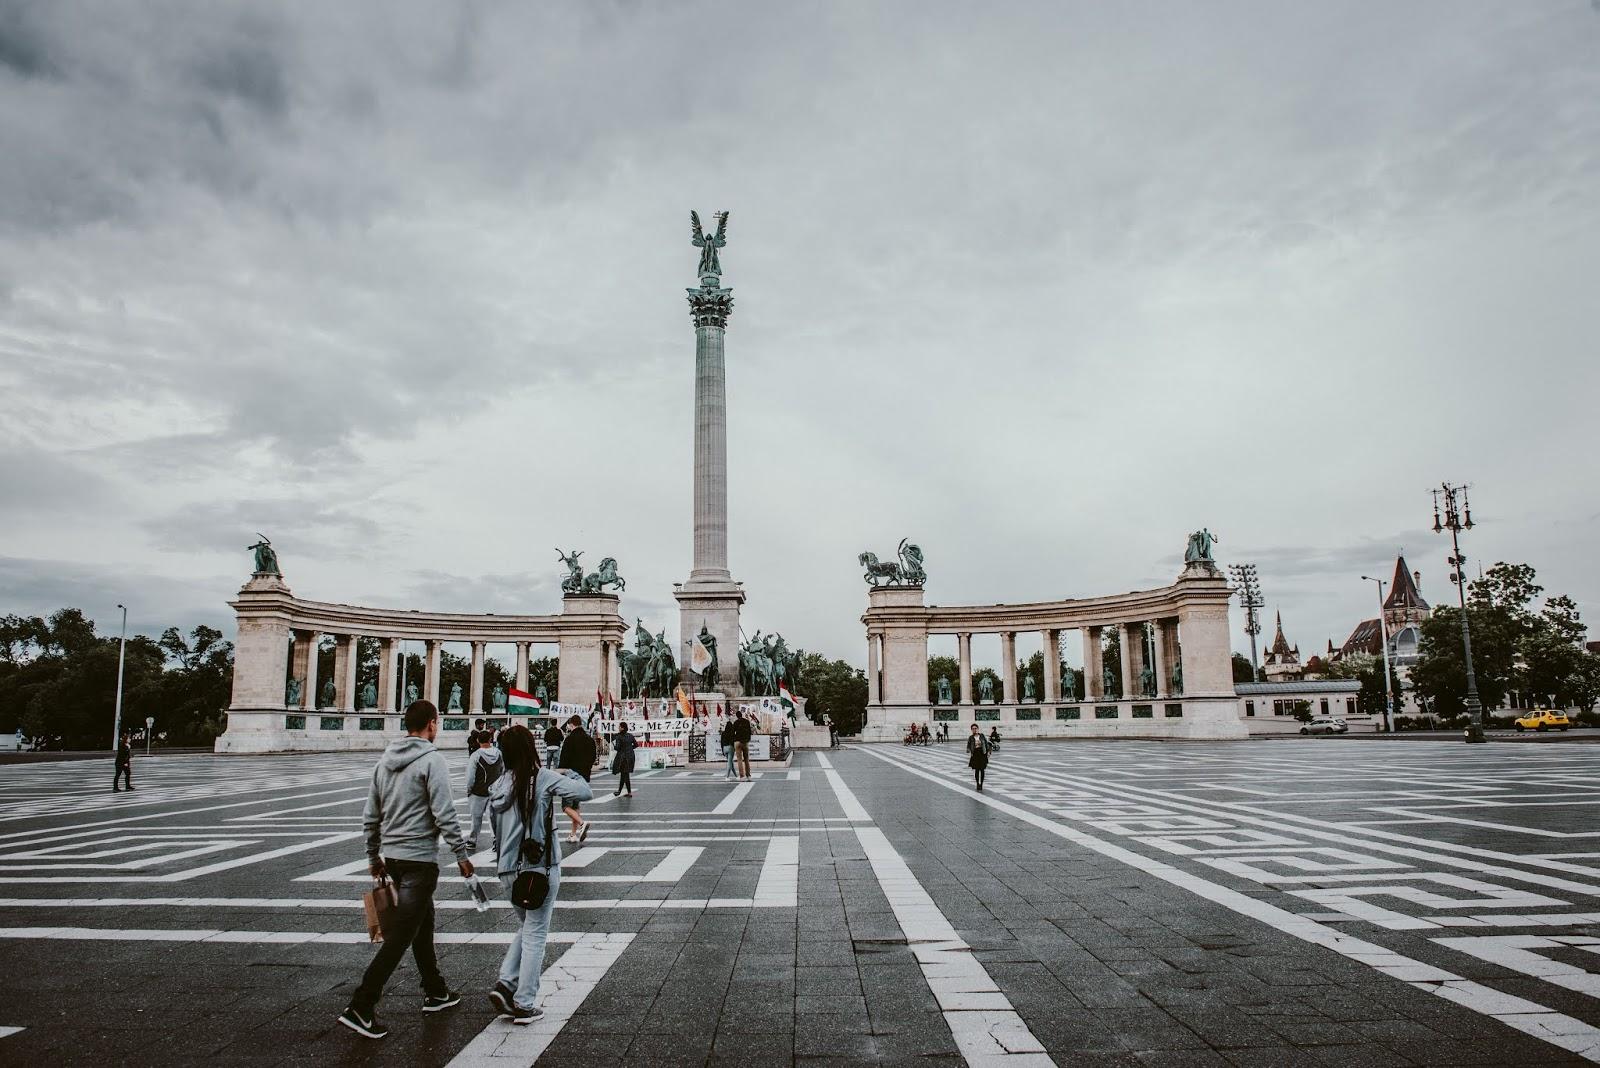 BUDAPESZT- ZA CO TAK LUBIĘ TO MIASTO